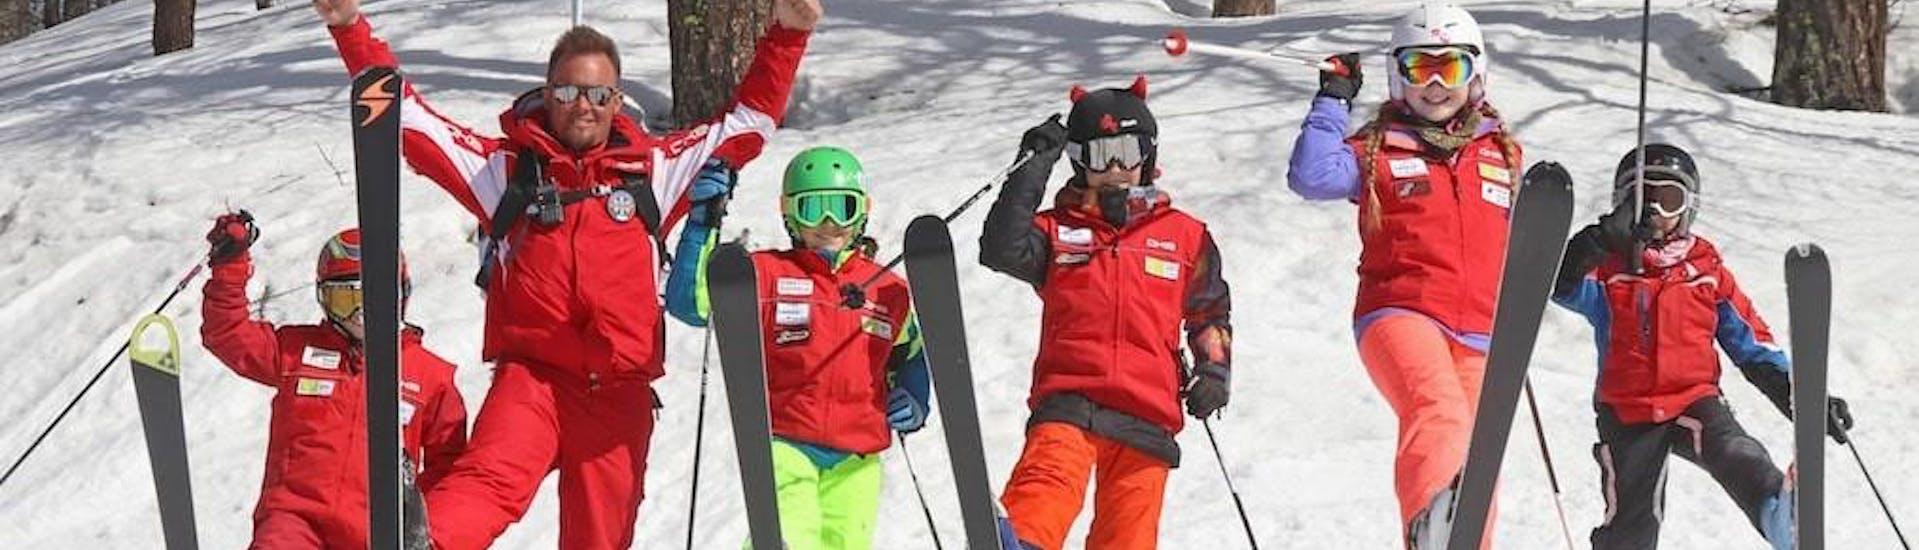 Kids Ski Lessons (4-14 y.) - All Levels